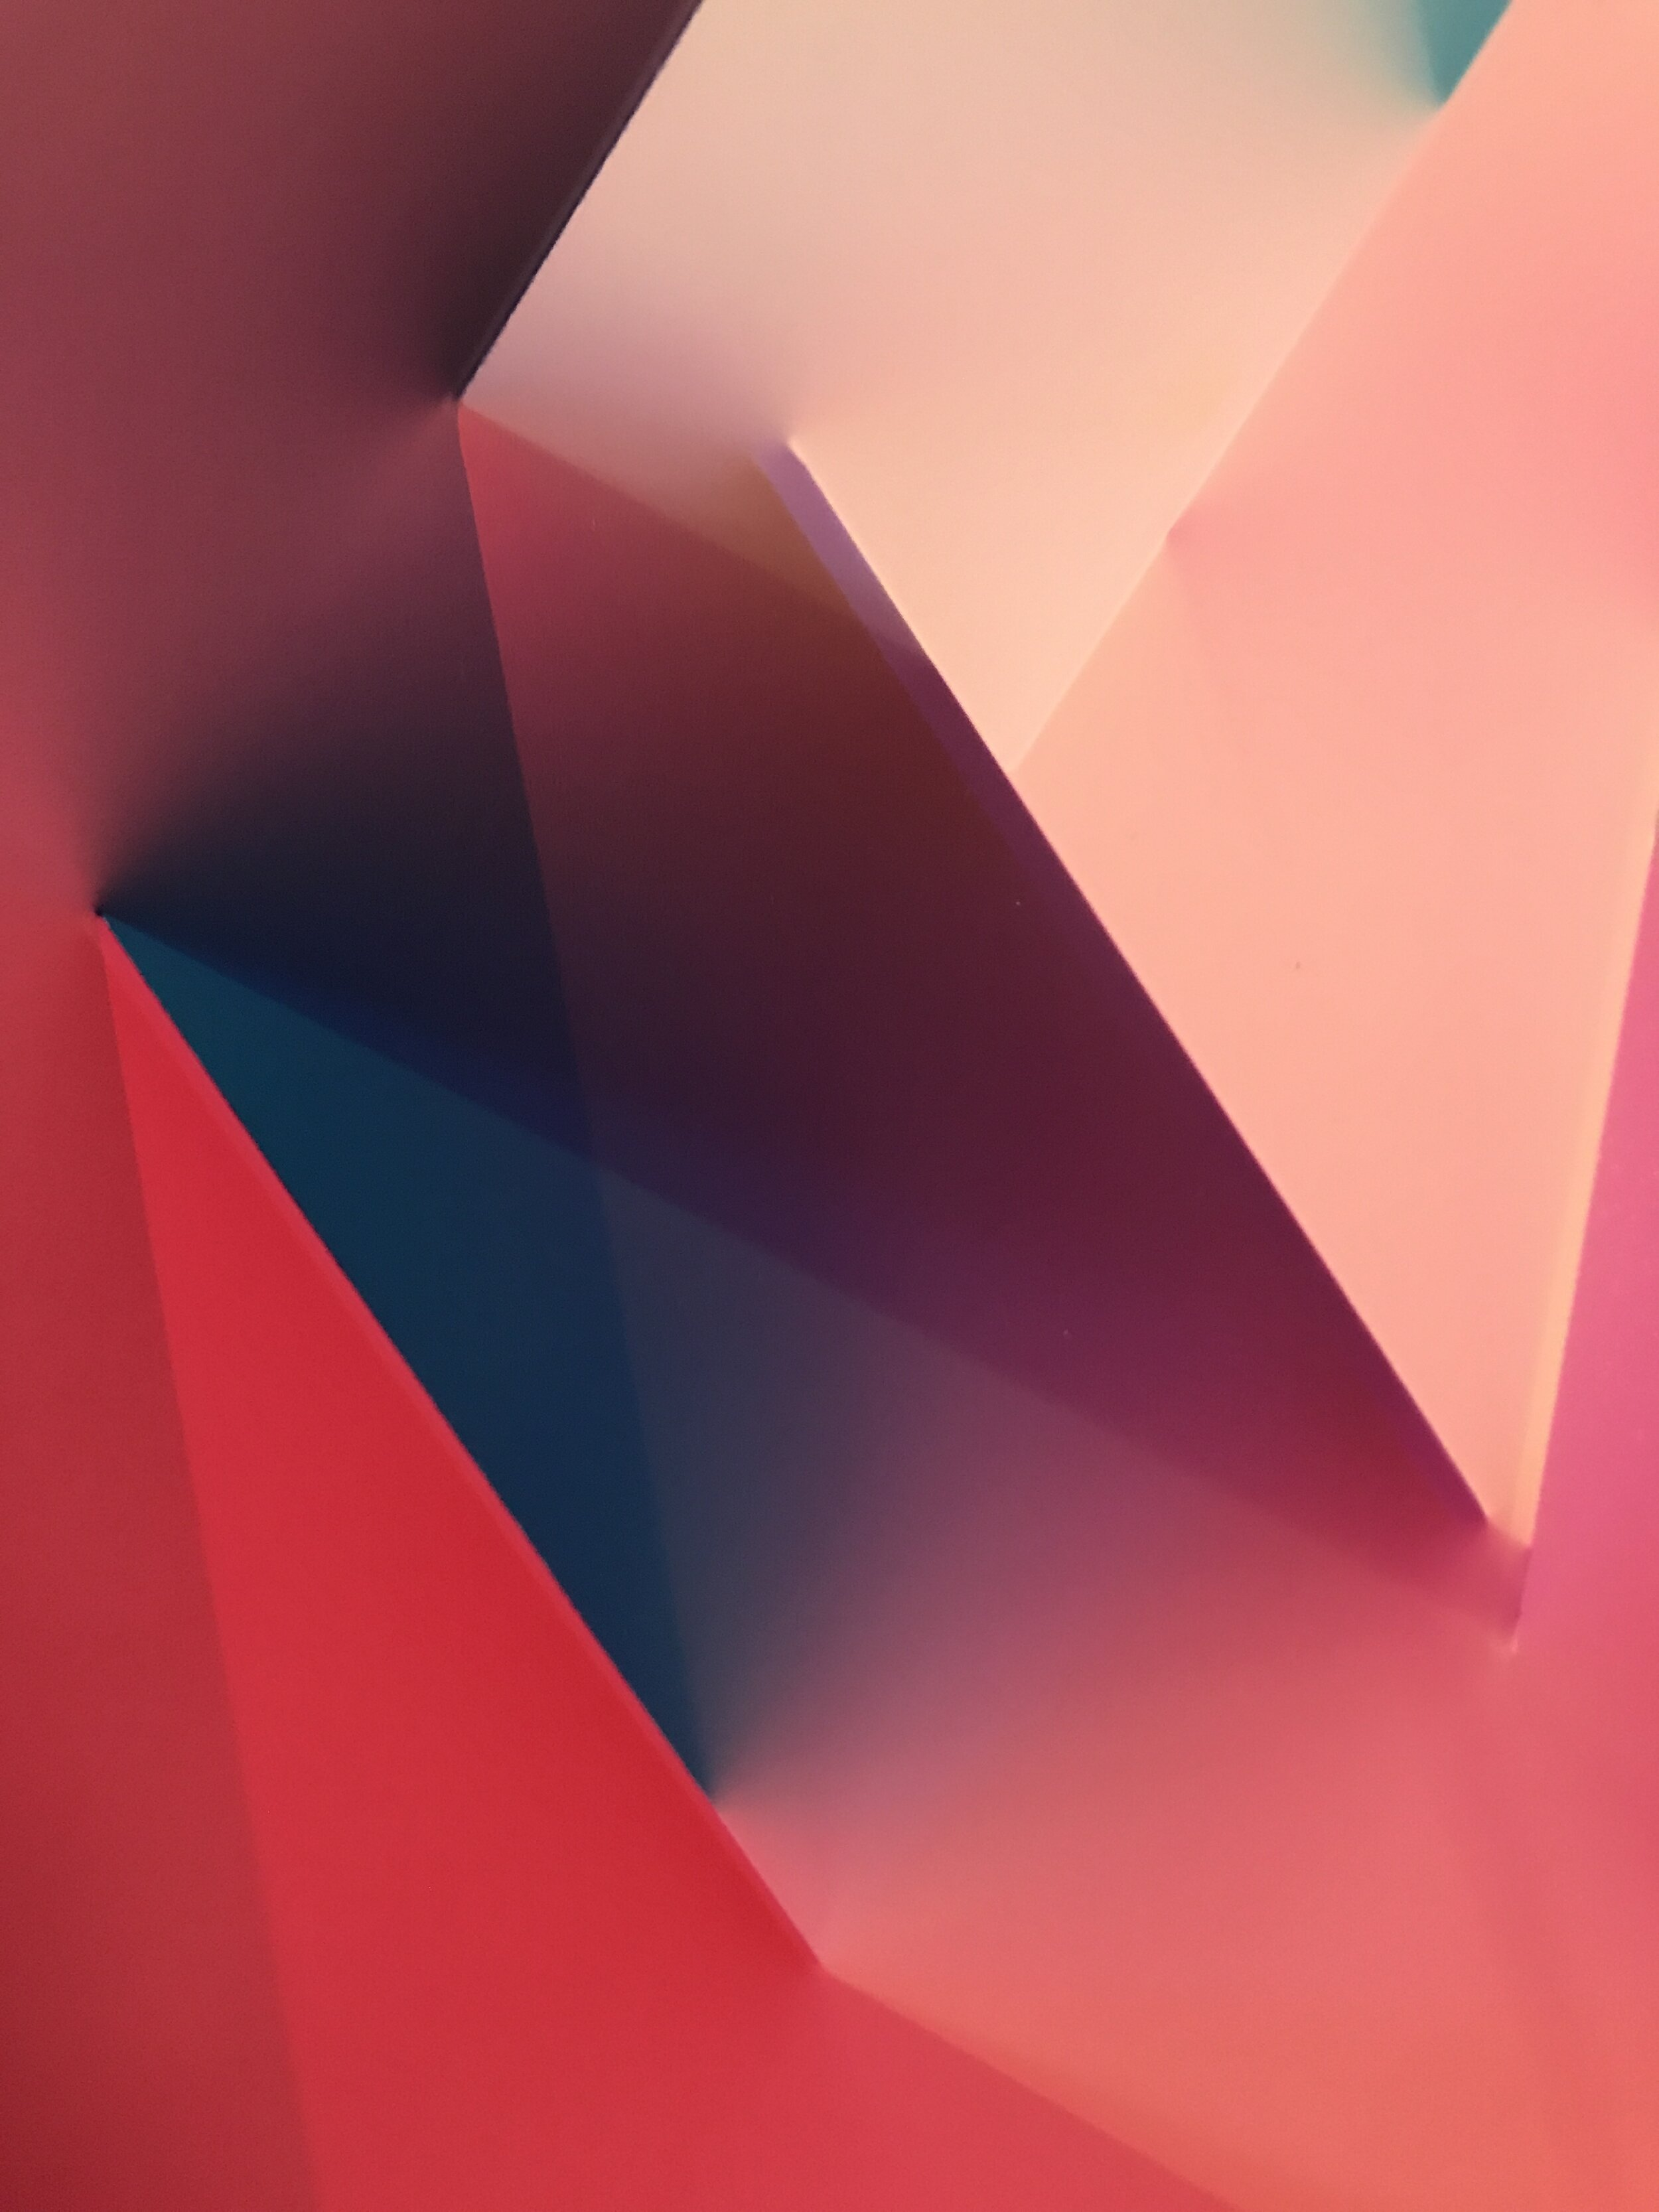 Natalja Kent Group Study Movement Artifacts Unusual Colors 4